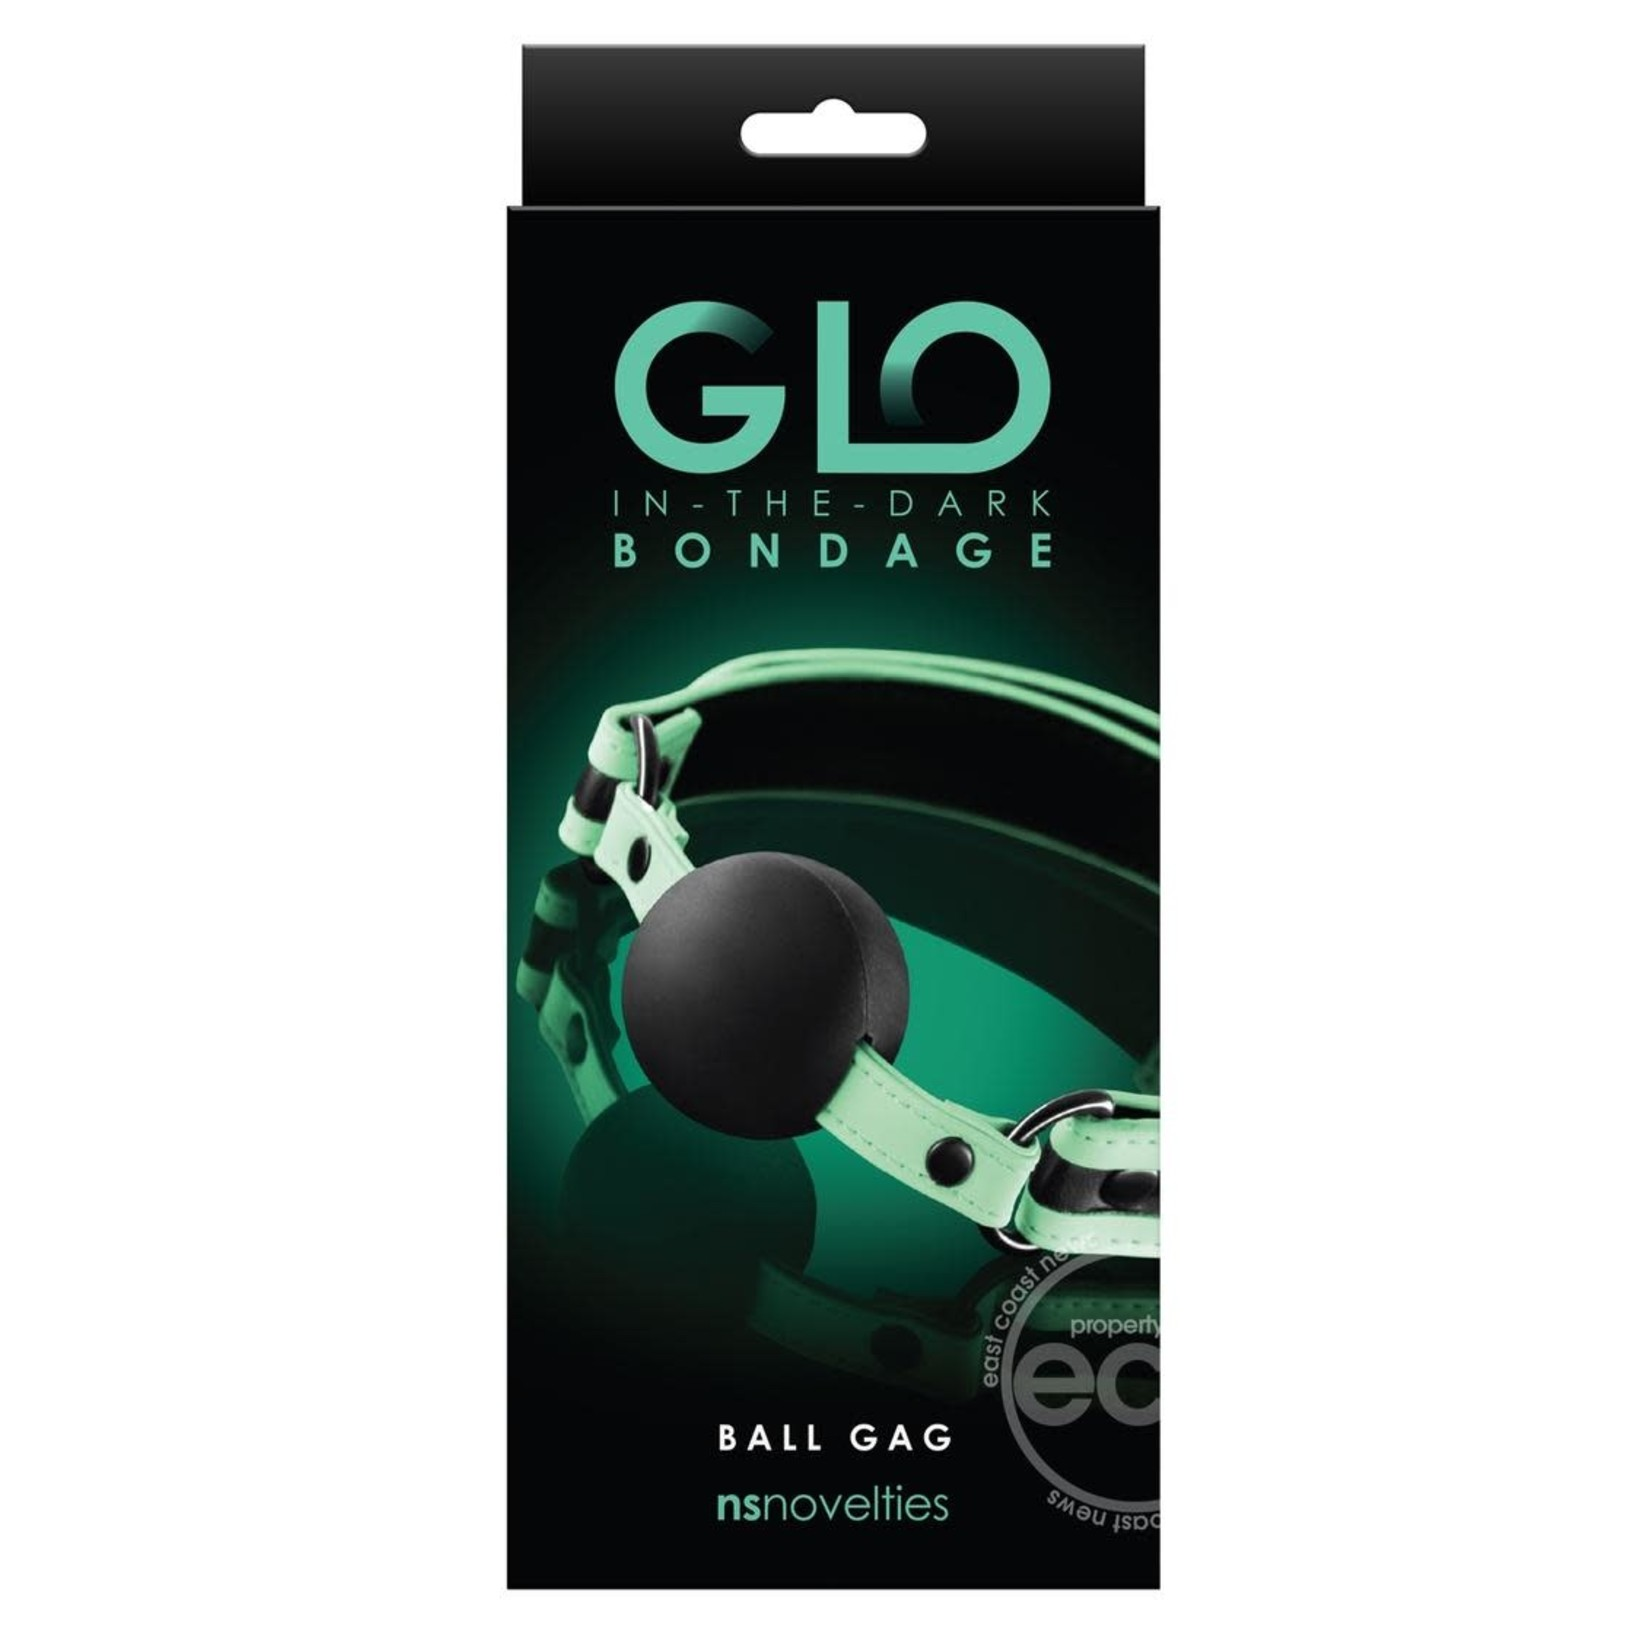 GLO Bondage Glow In The Dark Ball Gag - Green